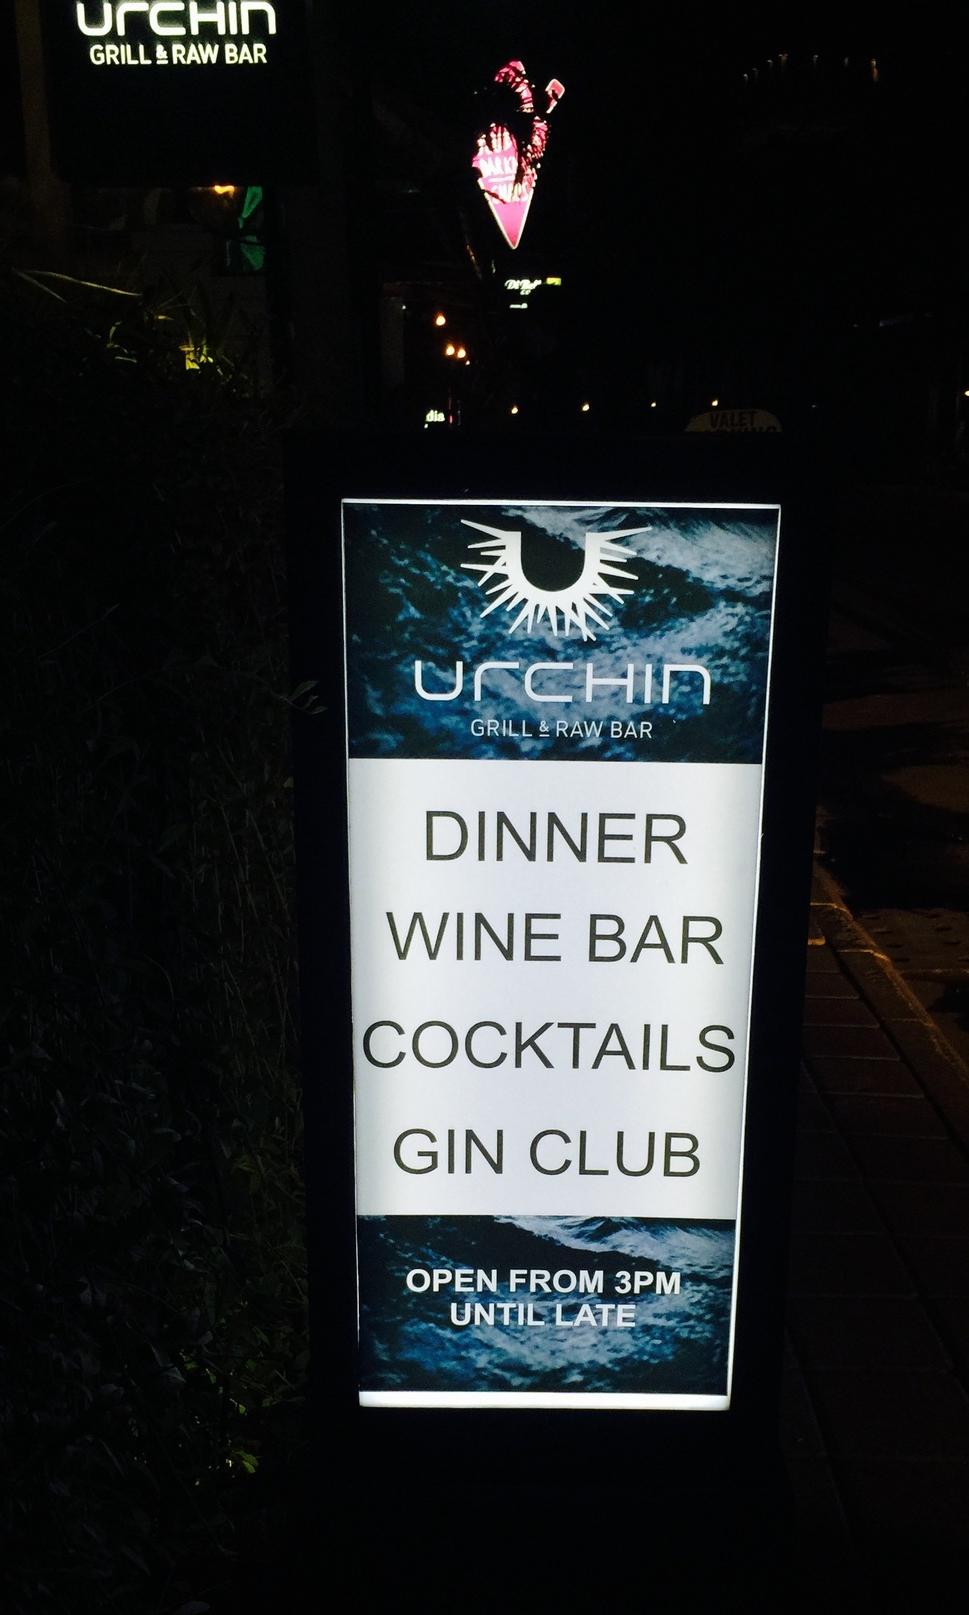 UrchinRawBar